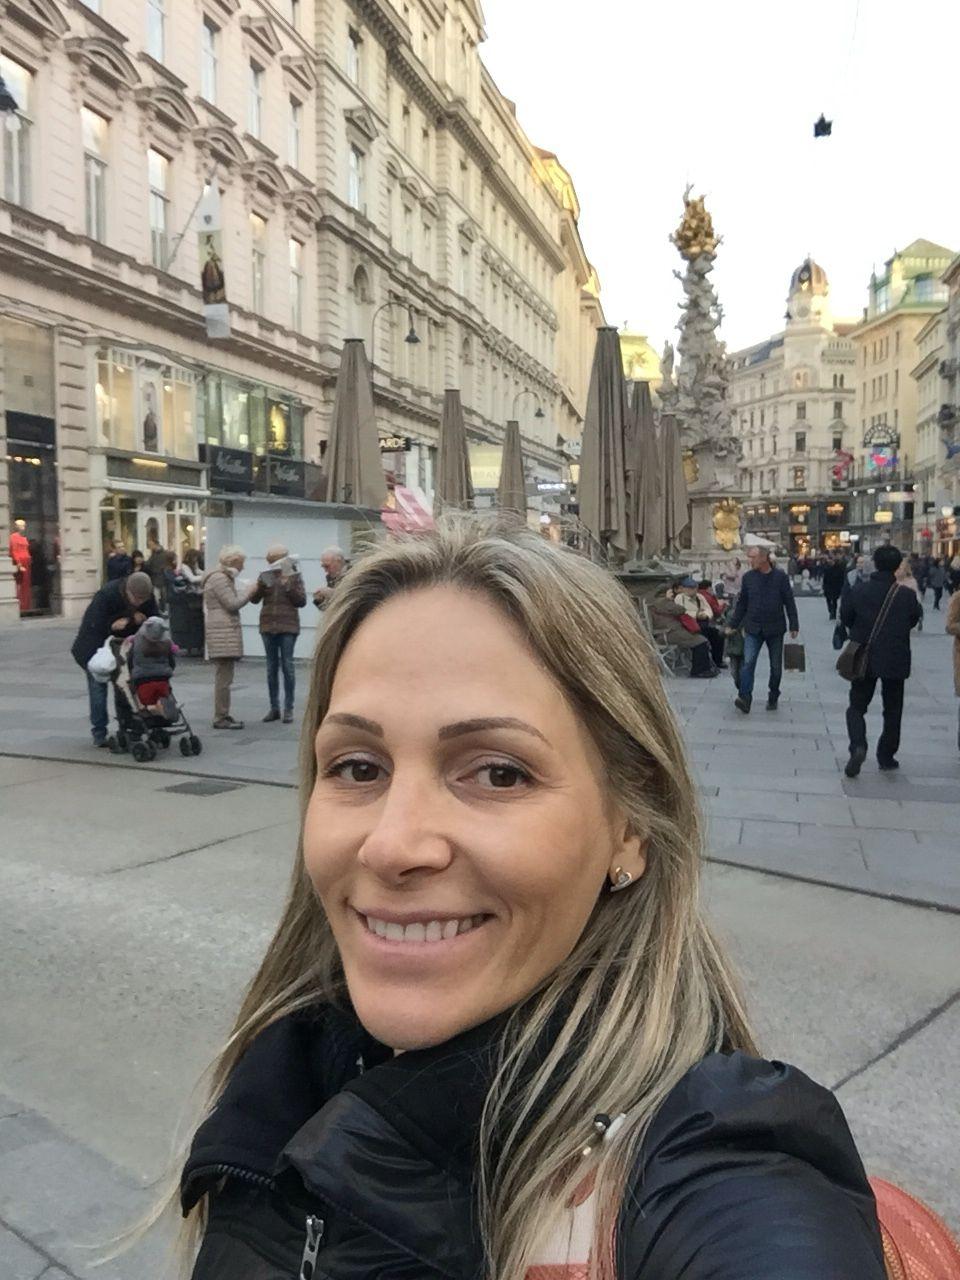 Vienna maravilhosa